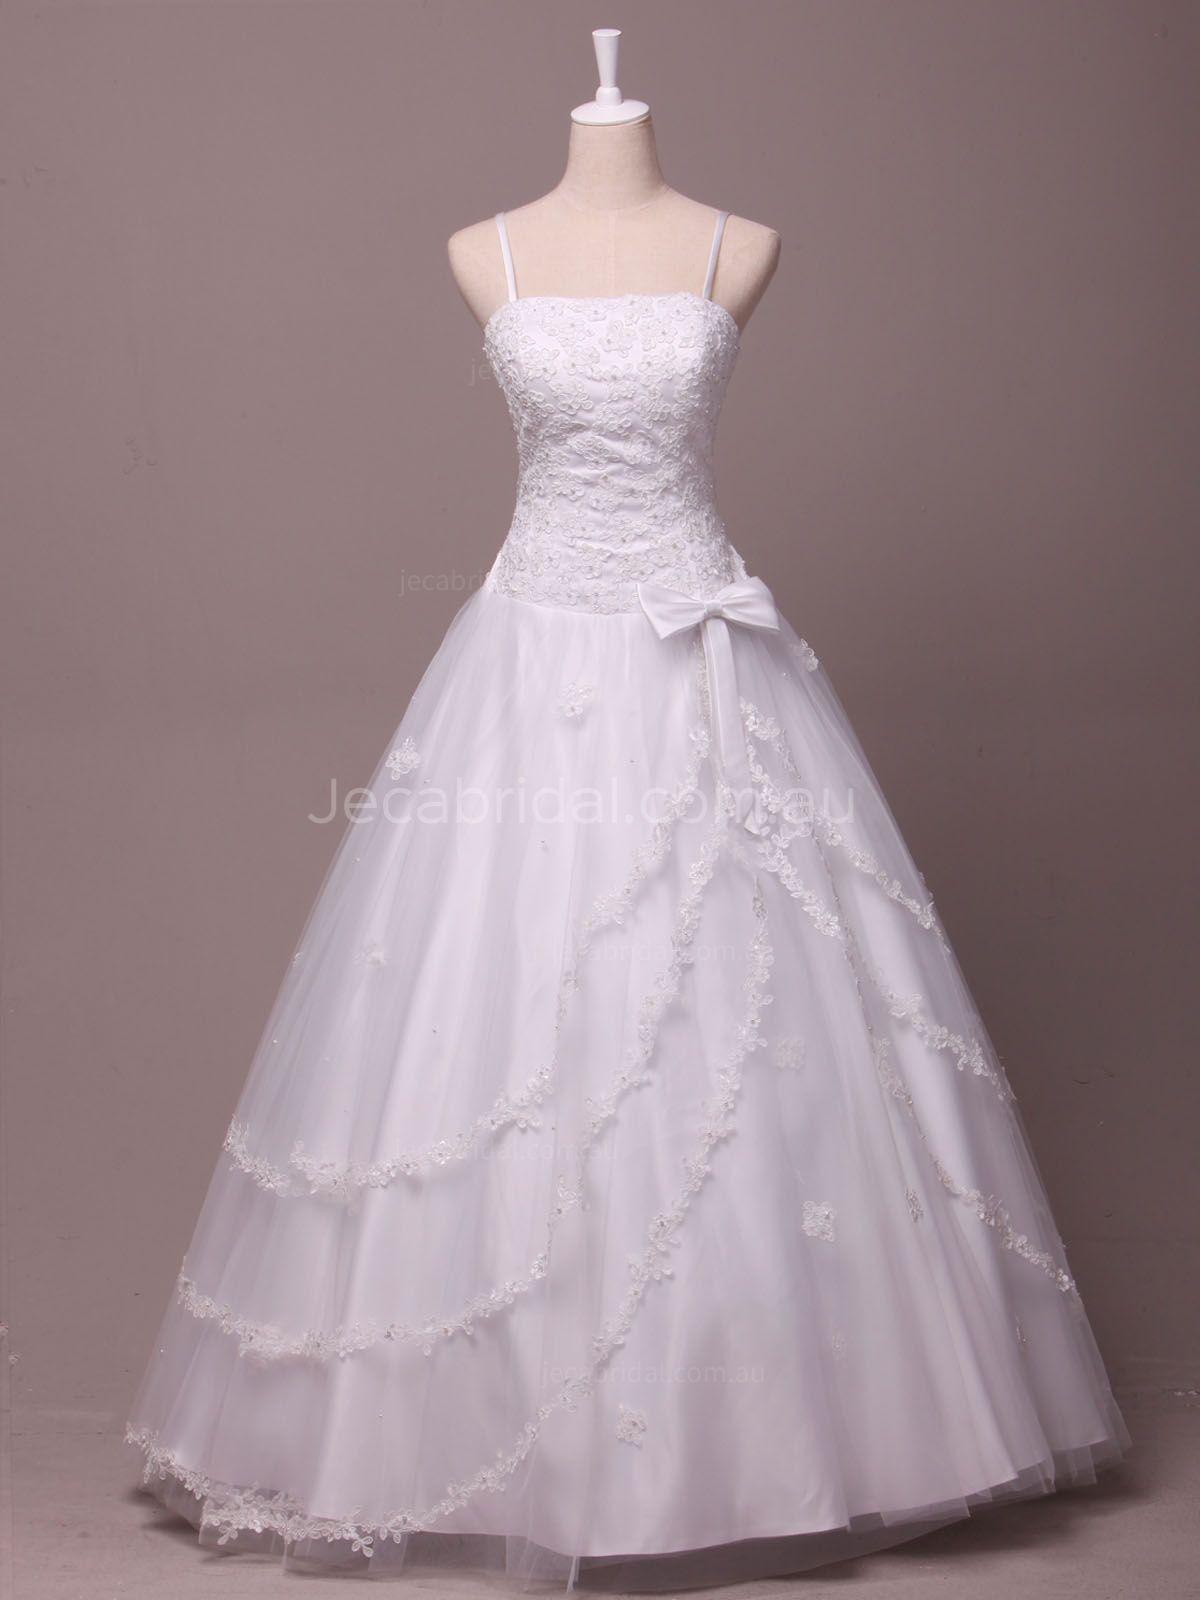 Spaghetti Strap Tulle Wedding Dress  Spaghetti Straps Tulle Wedding Dress Norah